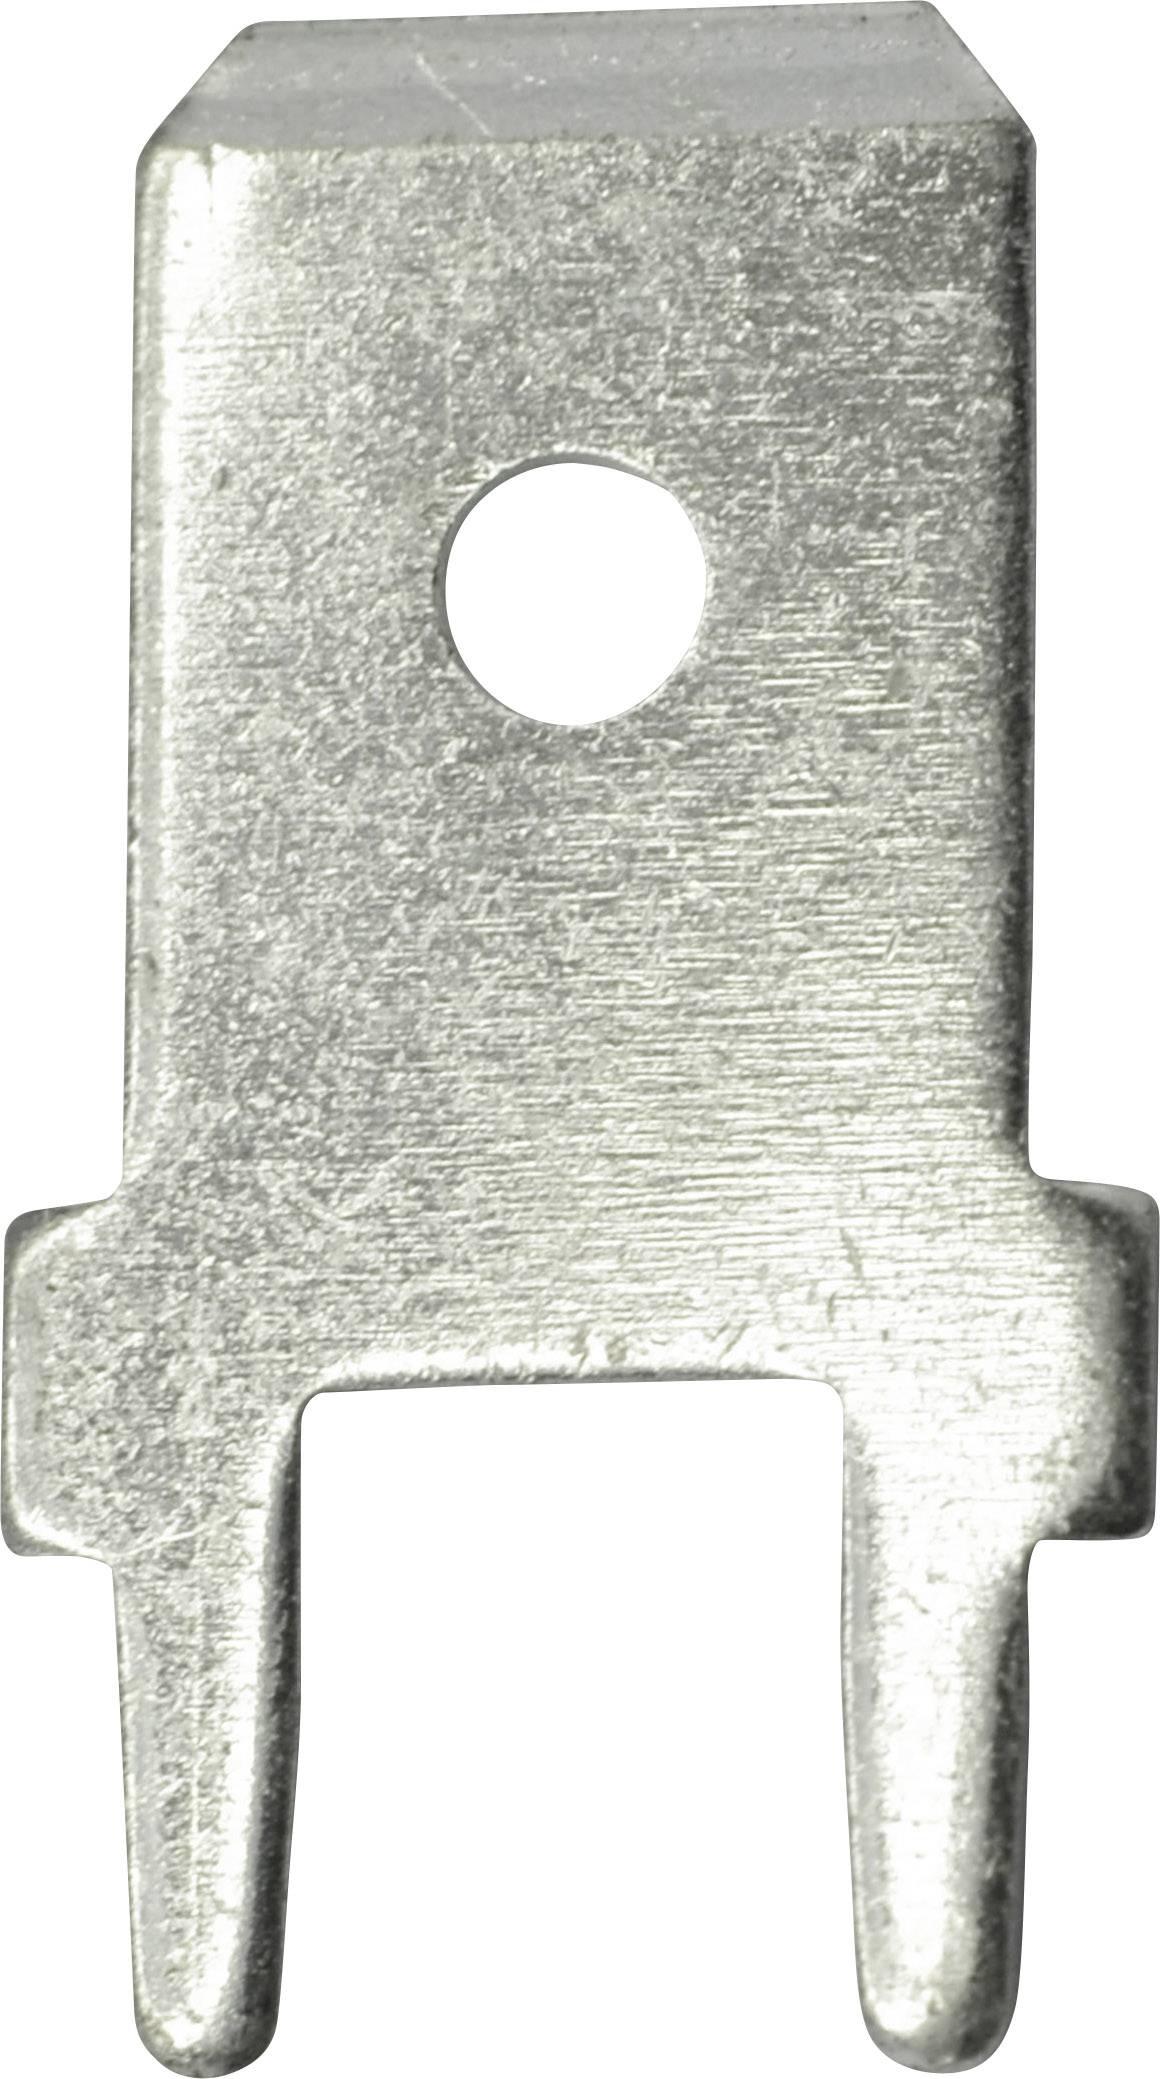 Jazýček konektora Vogt Verbindungstechnik 3866A.68 6.3 mm x 0.8 mm, 180 °, neizolované, kov, 100 ks